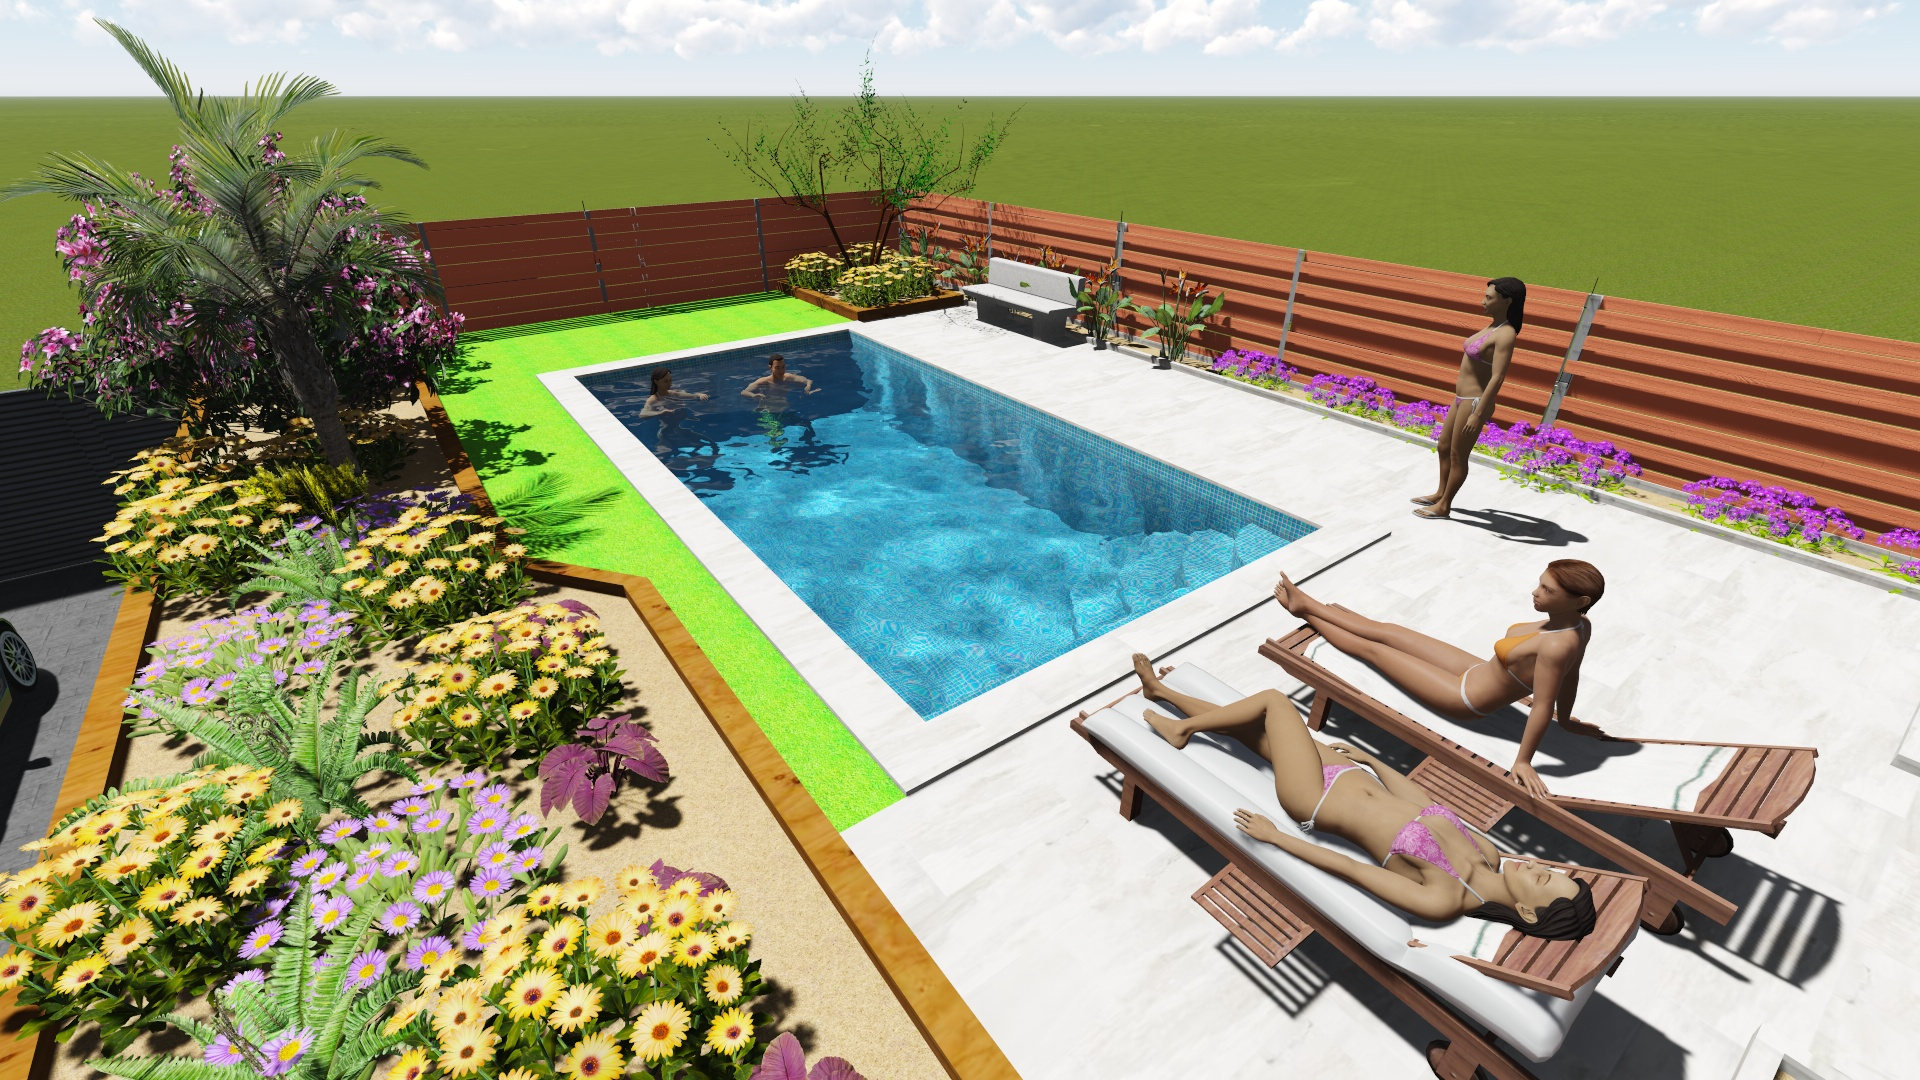 Construcci n de piscinas de obra for Construccion de piscinas de obra